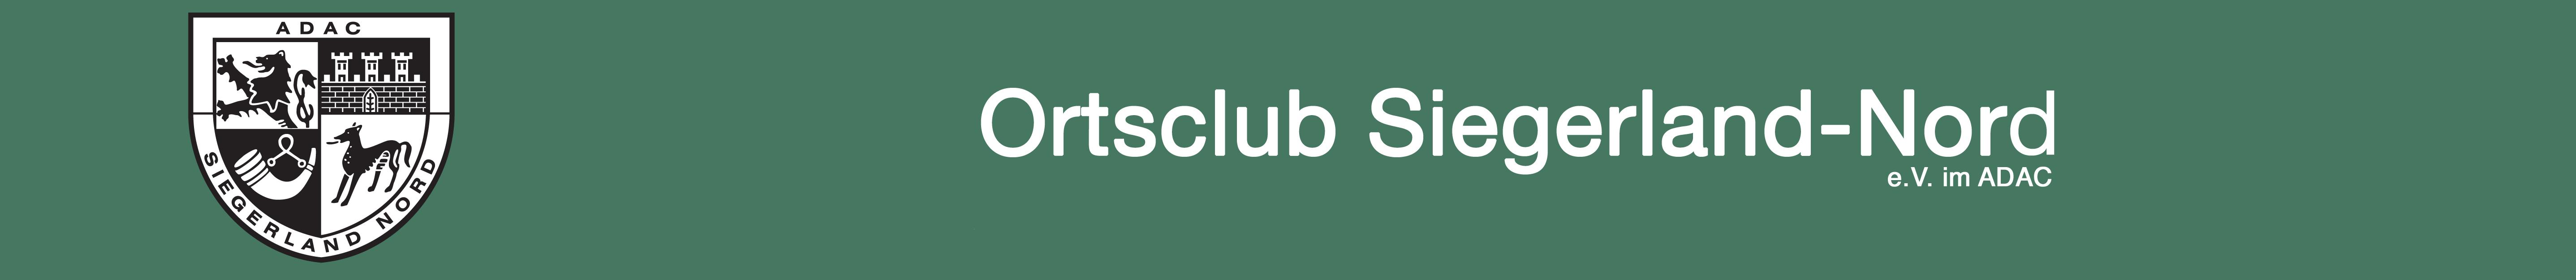 Ortsclub Siegerland-Nord e.V. im ADAC